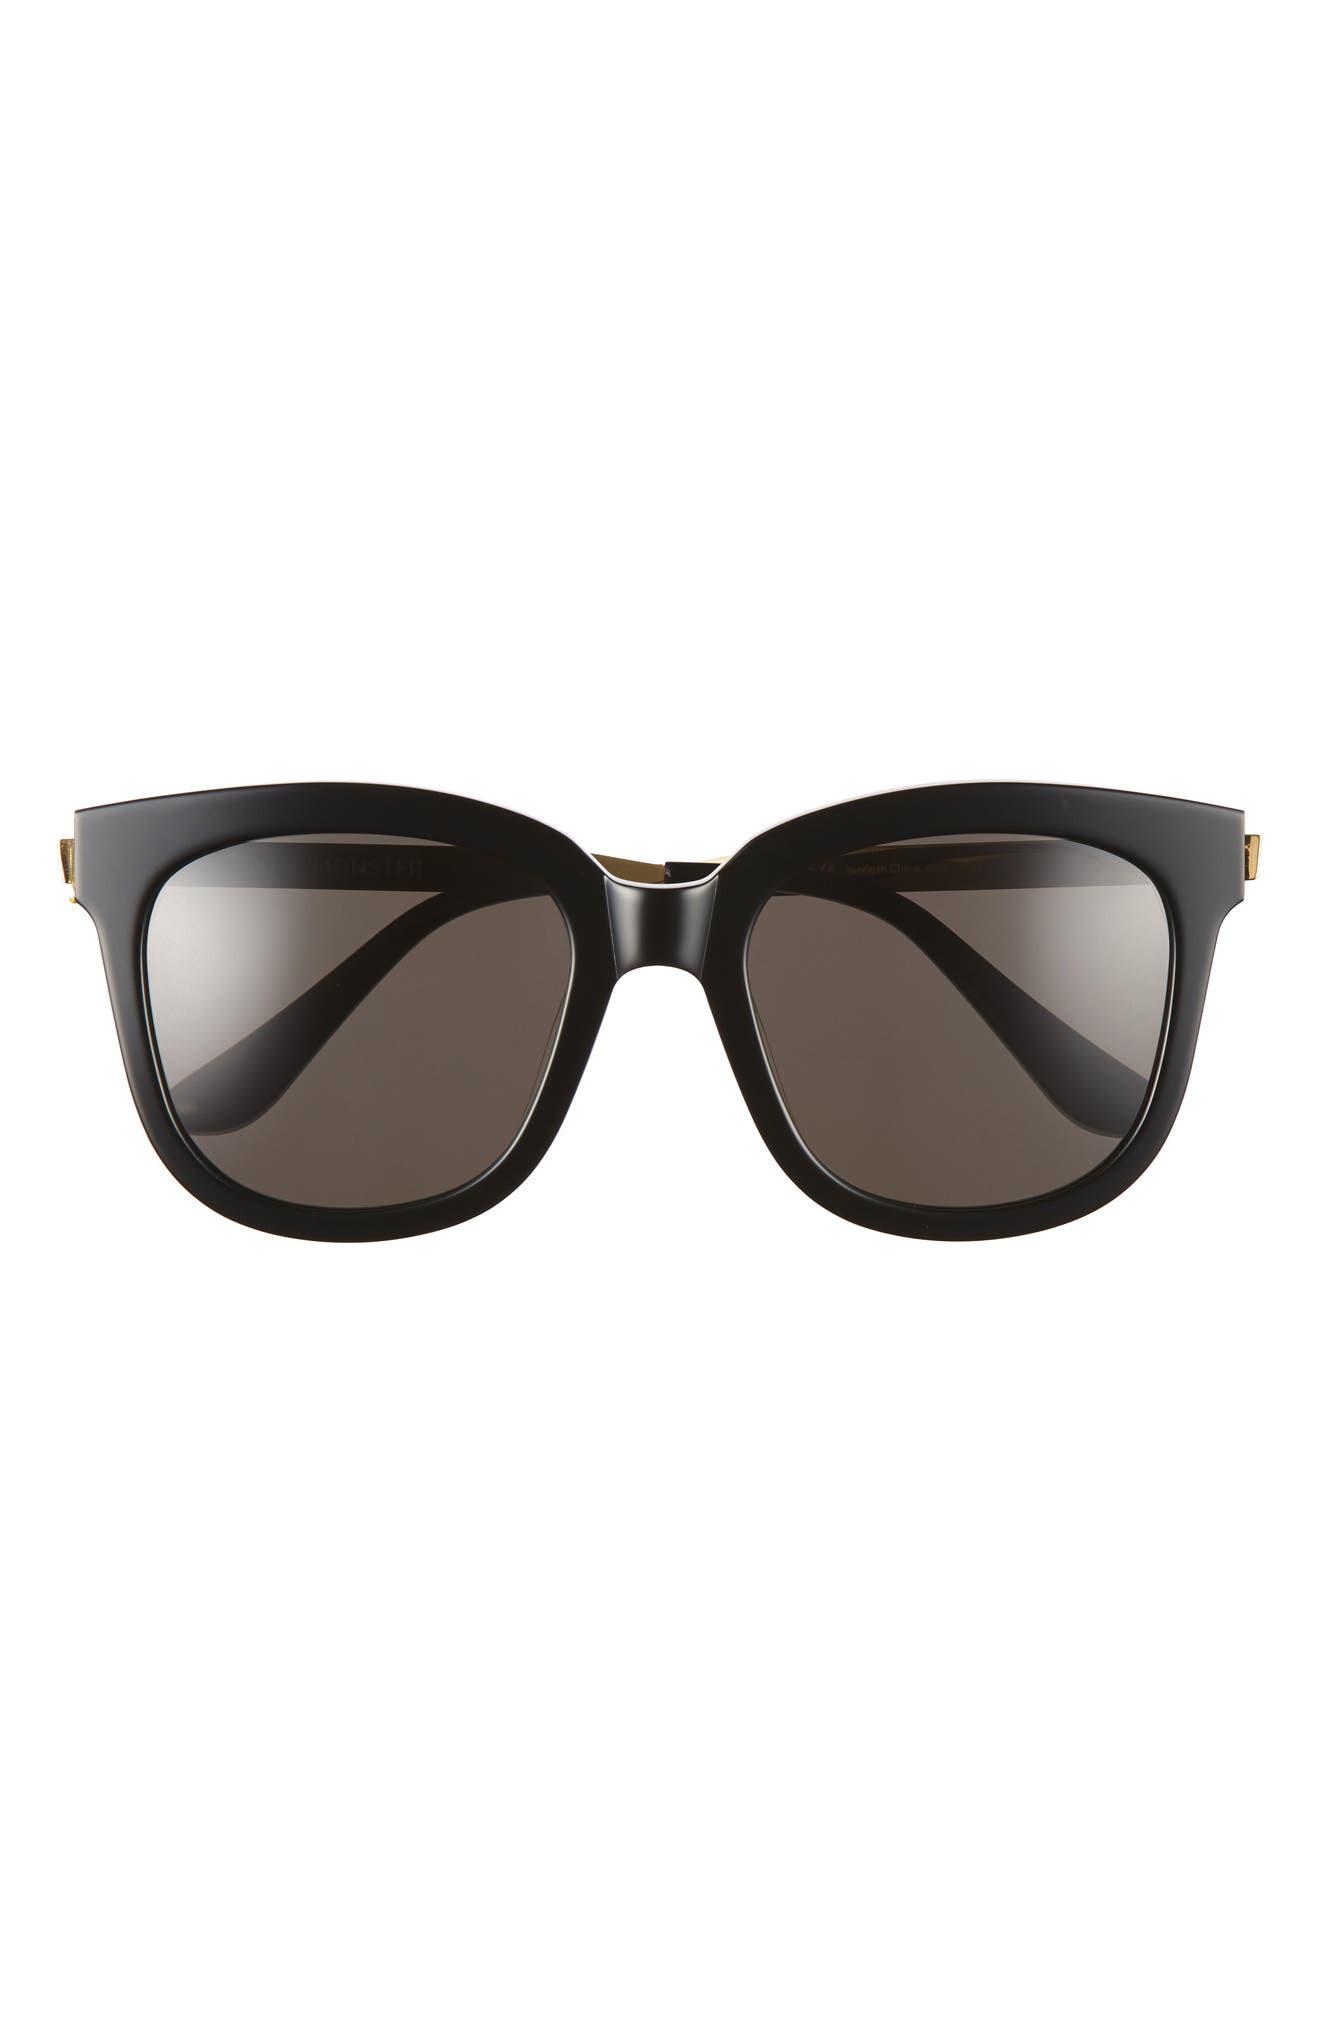 Absente 54mm Sunglasses,                             Alternate thumbnail 2, color,                             001